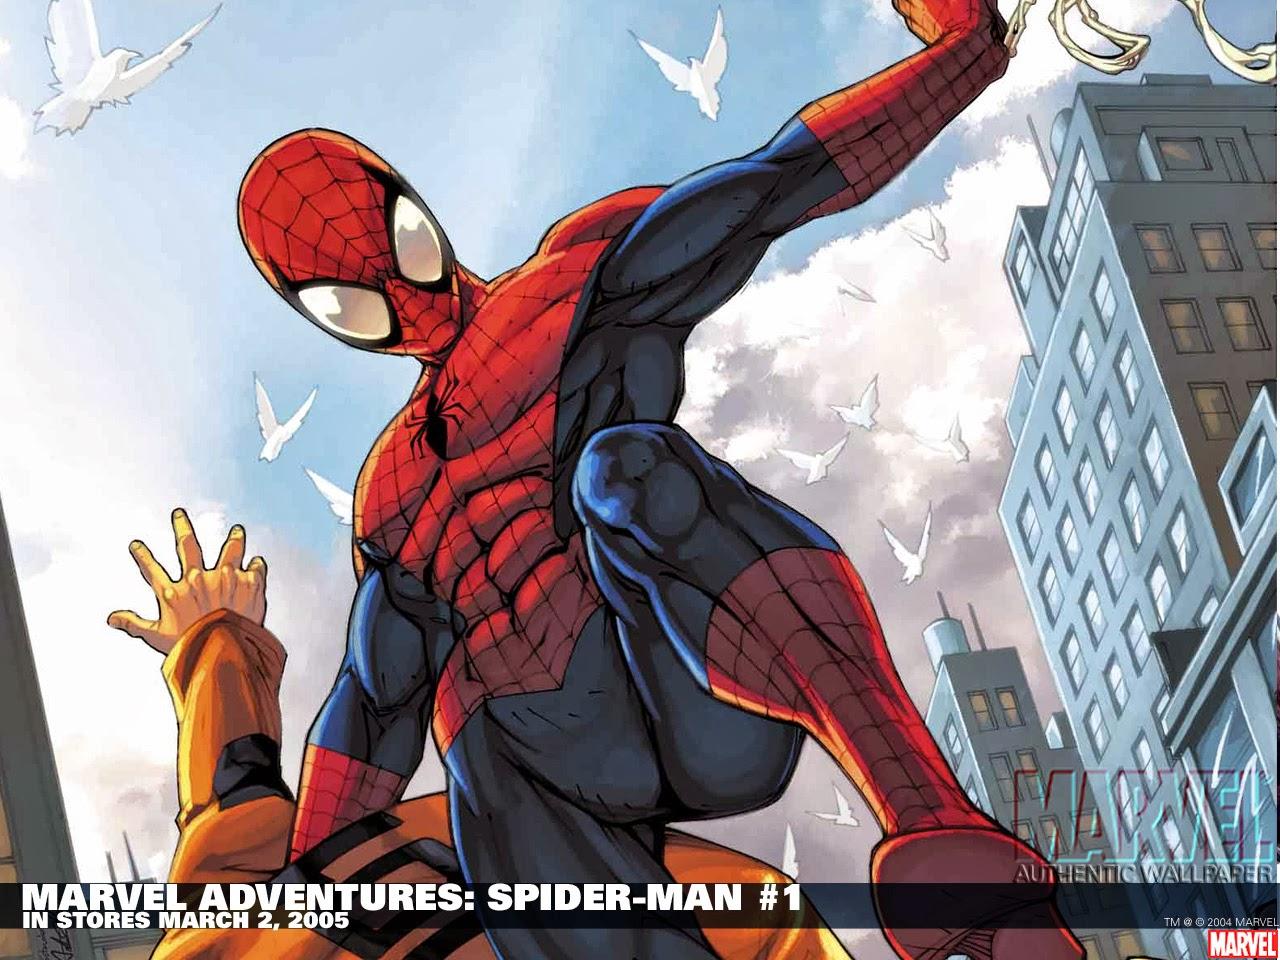 Fondos De Pantalla HD: Fondo De Pantalla Marvel Adventures